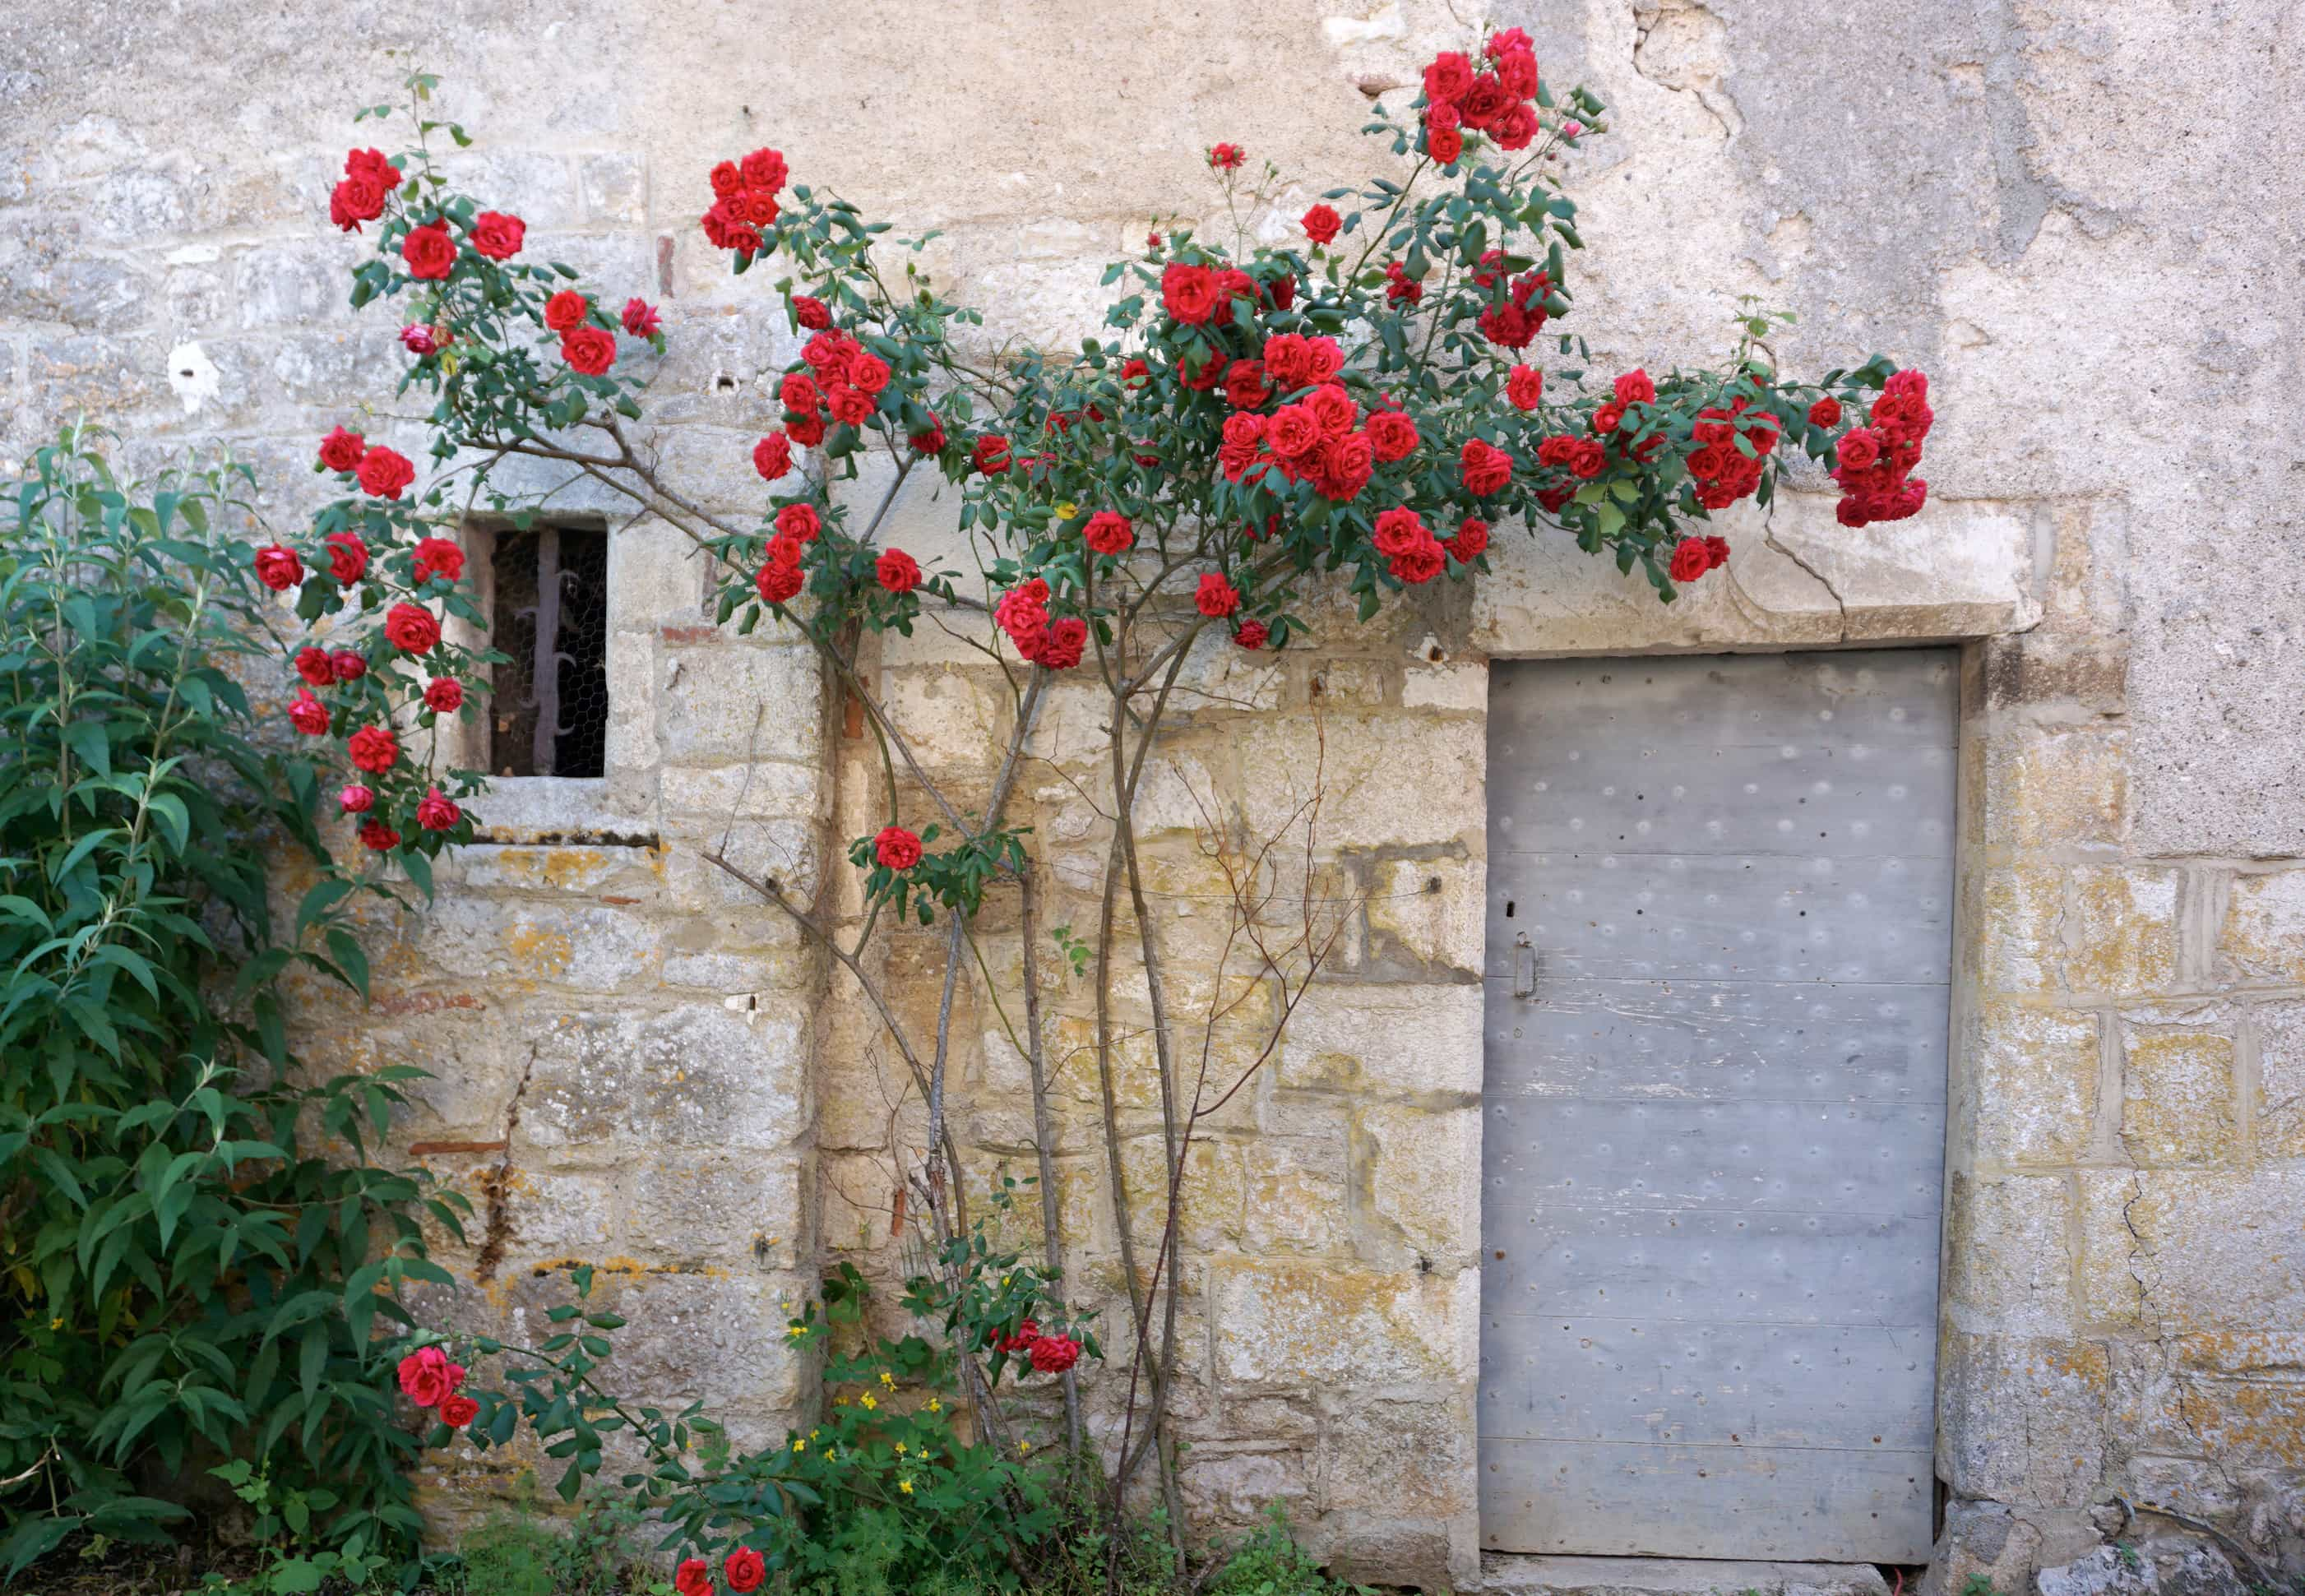 Saint cirq lapopie village france